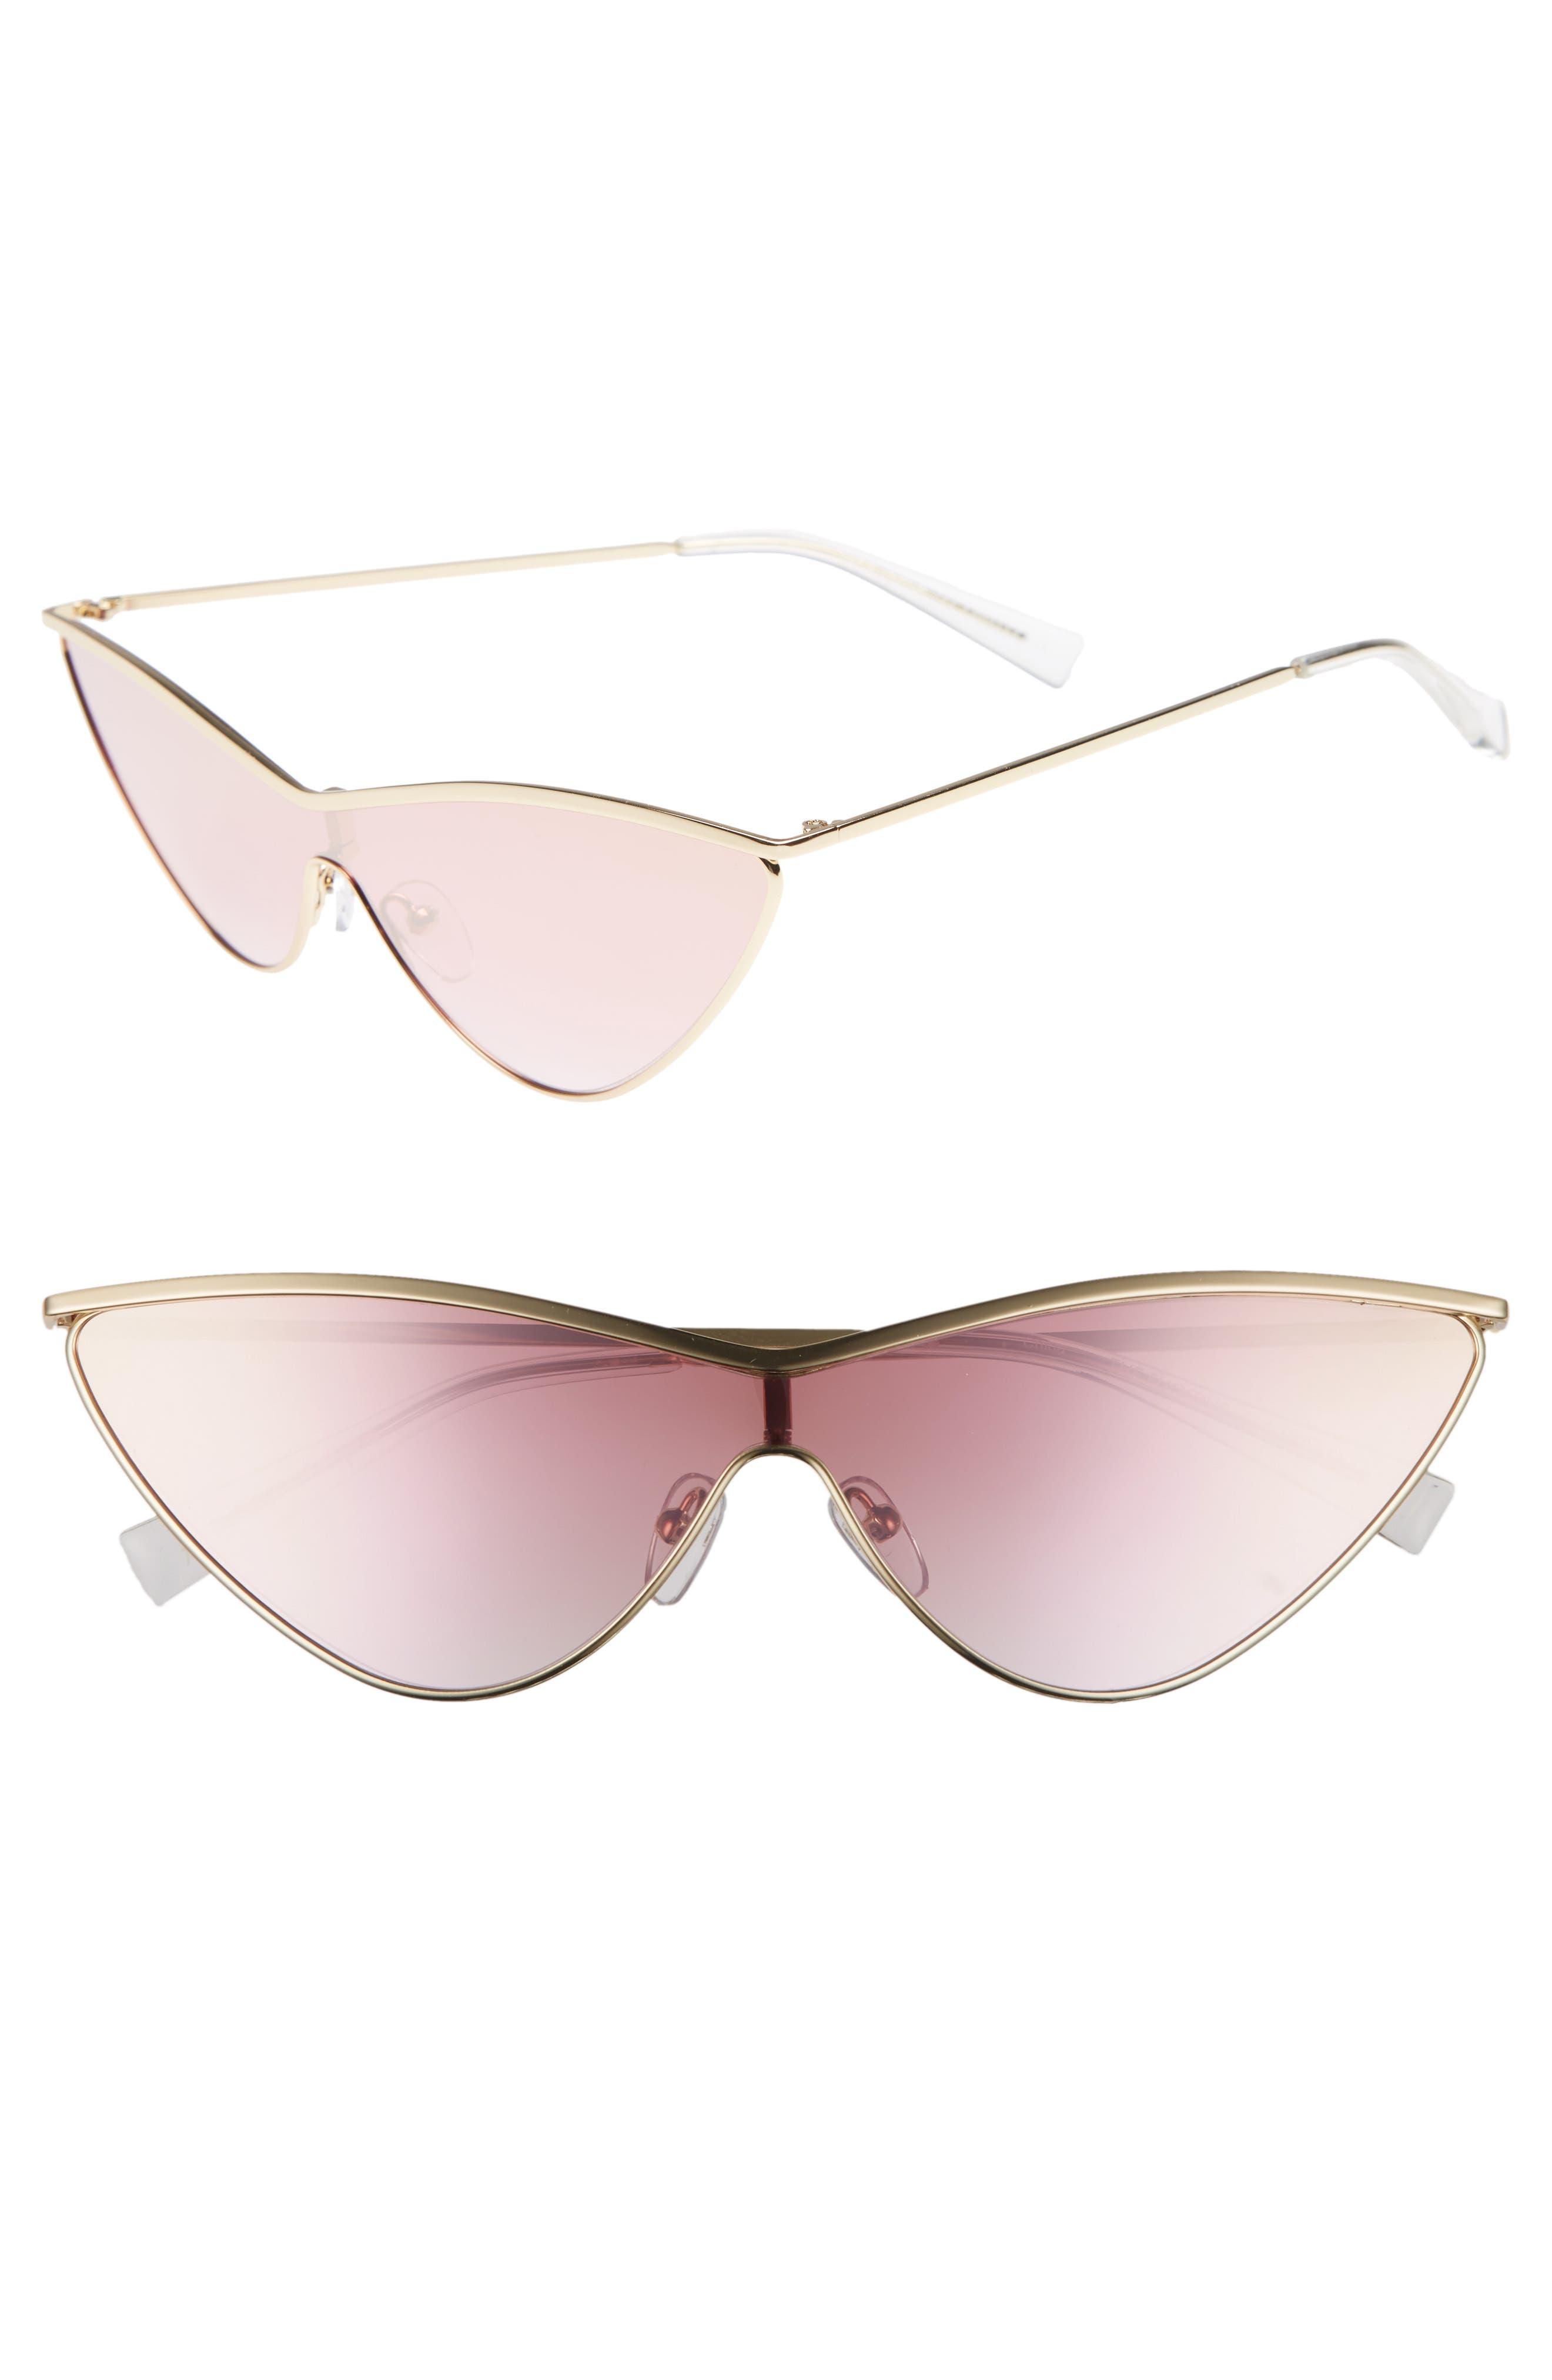 Alternate Image 1 Selected - Adam Selman x Le Specs Luxe The Fugitive 71mm Sunglasses